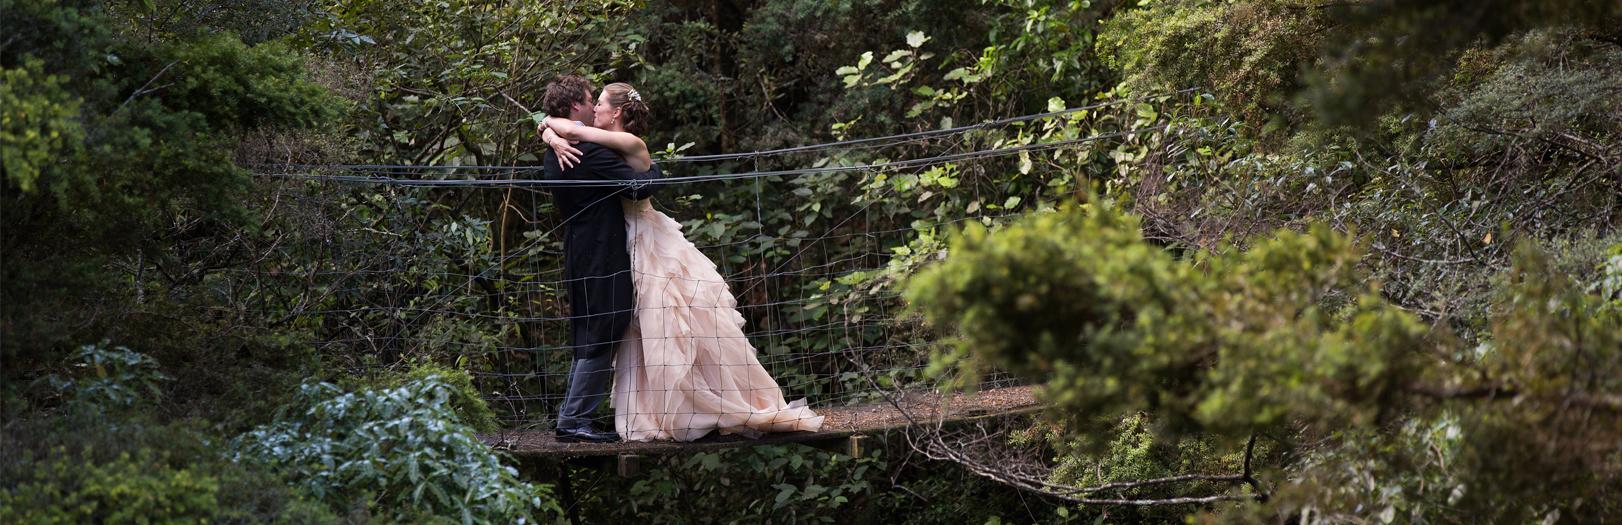 chb-wedding-photographers